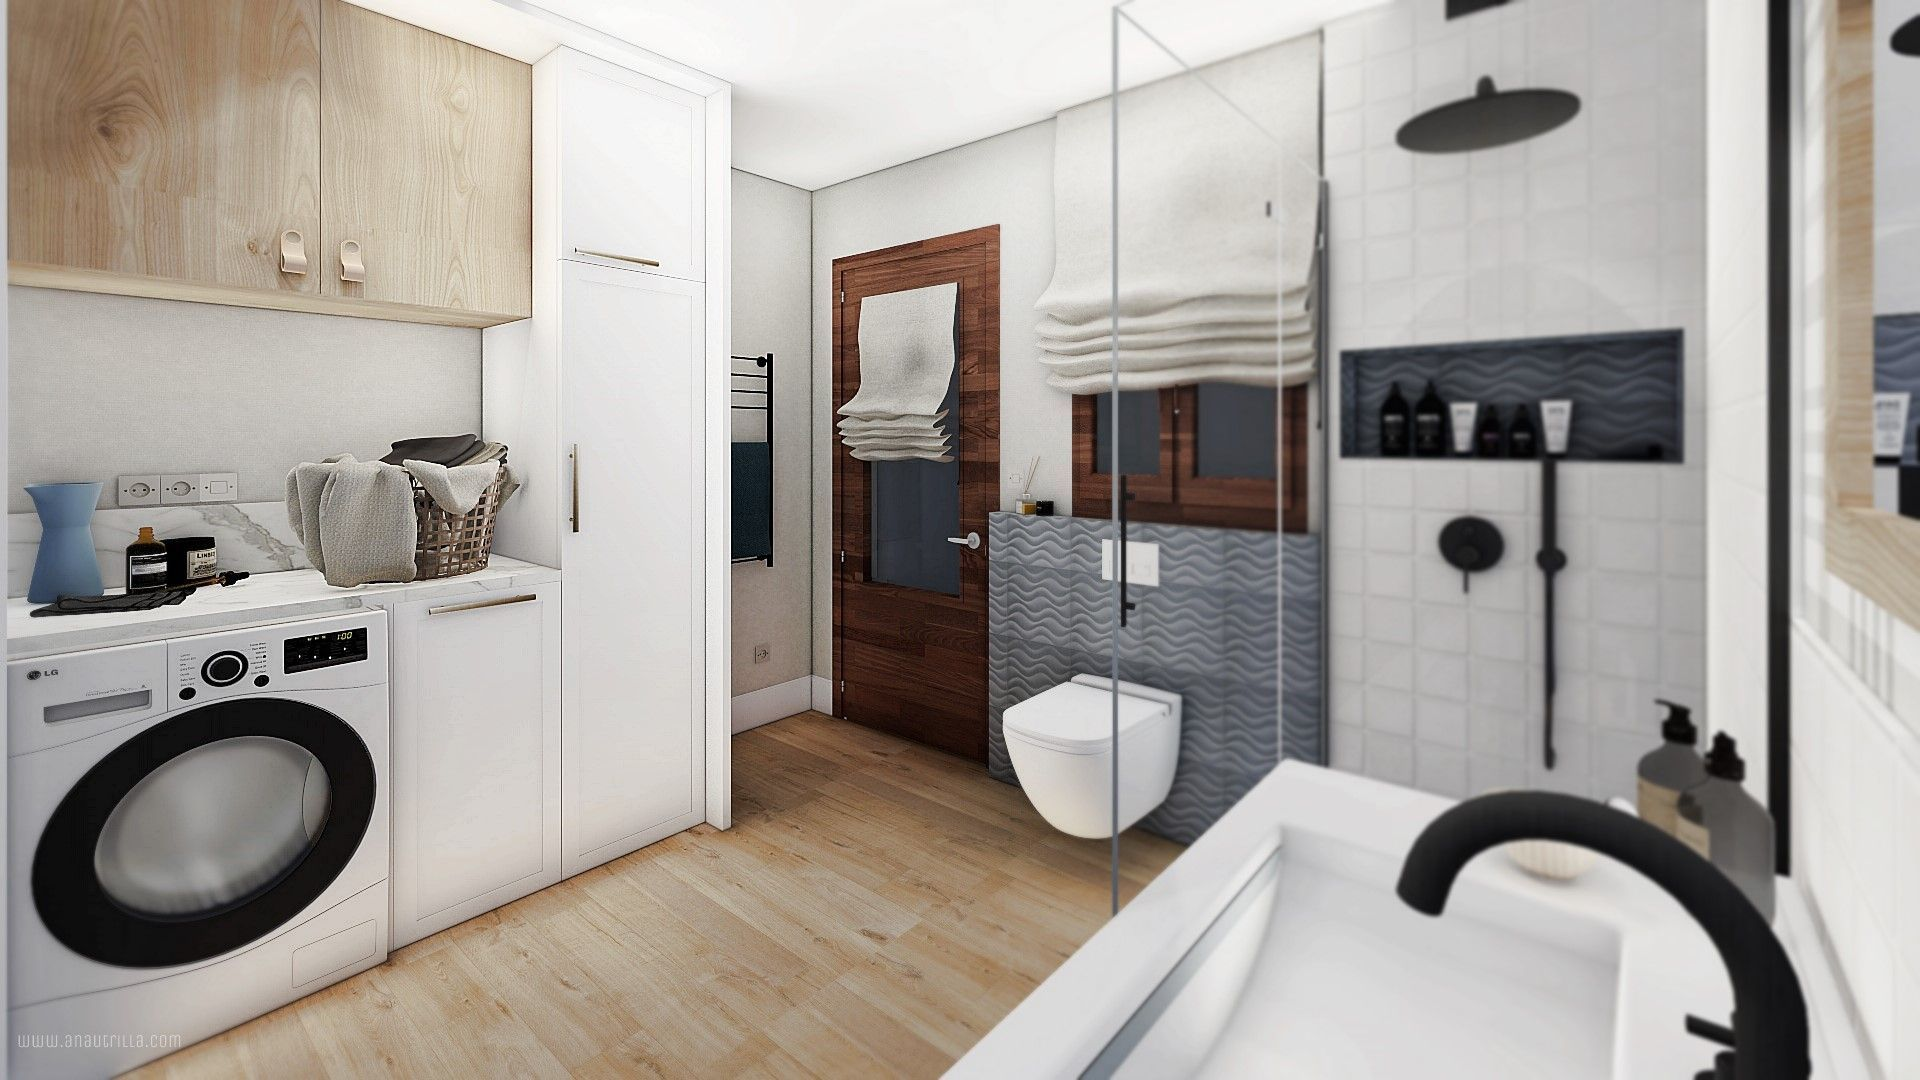 Espacio de baño con lavandería en 3D, proyecto de diseño de interiores a medida online #Anautrillainteriorismo @utrillanais